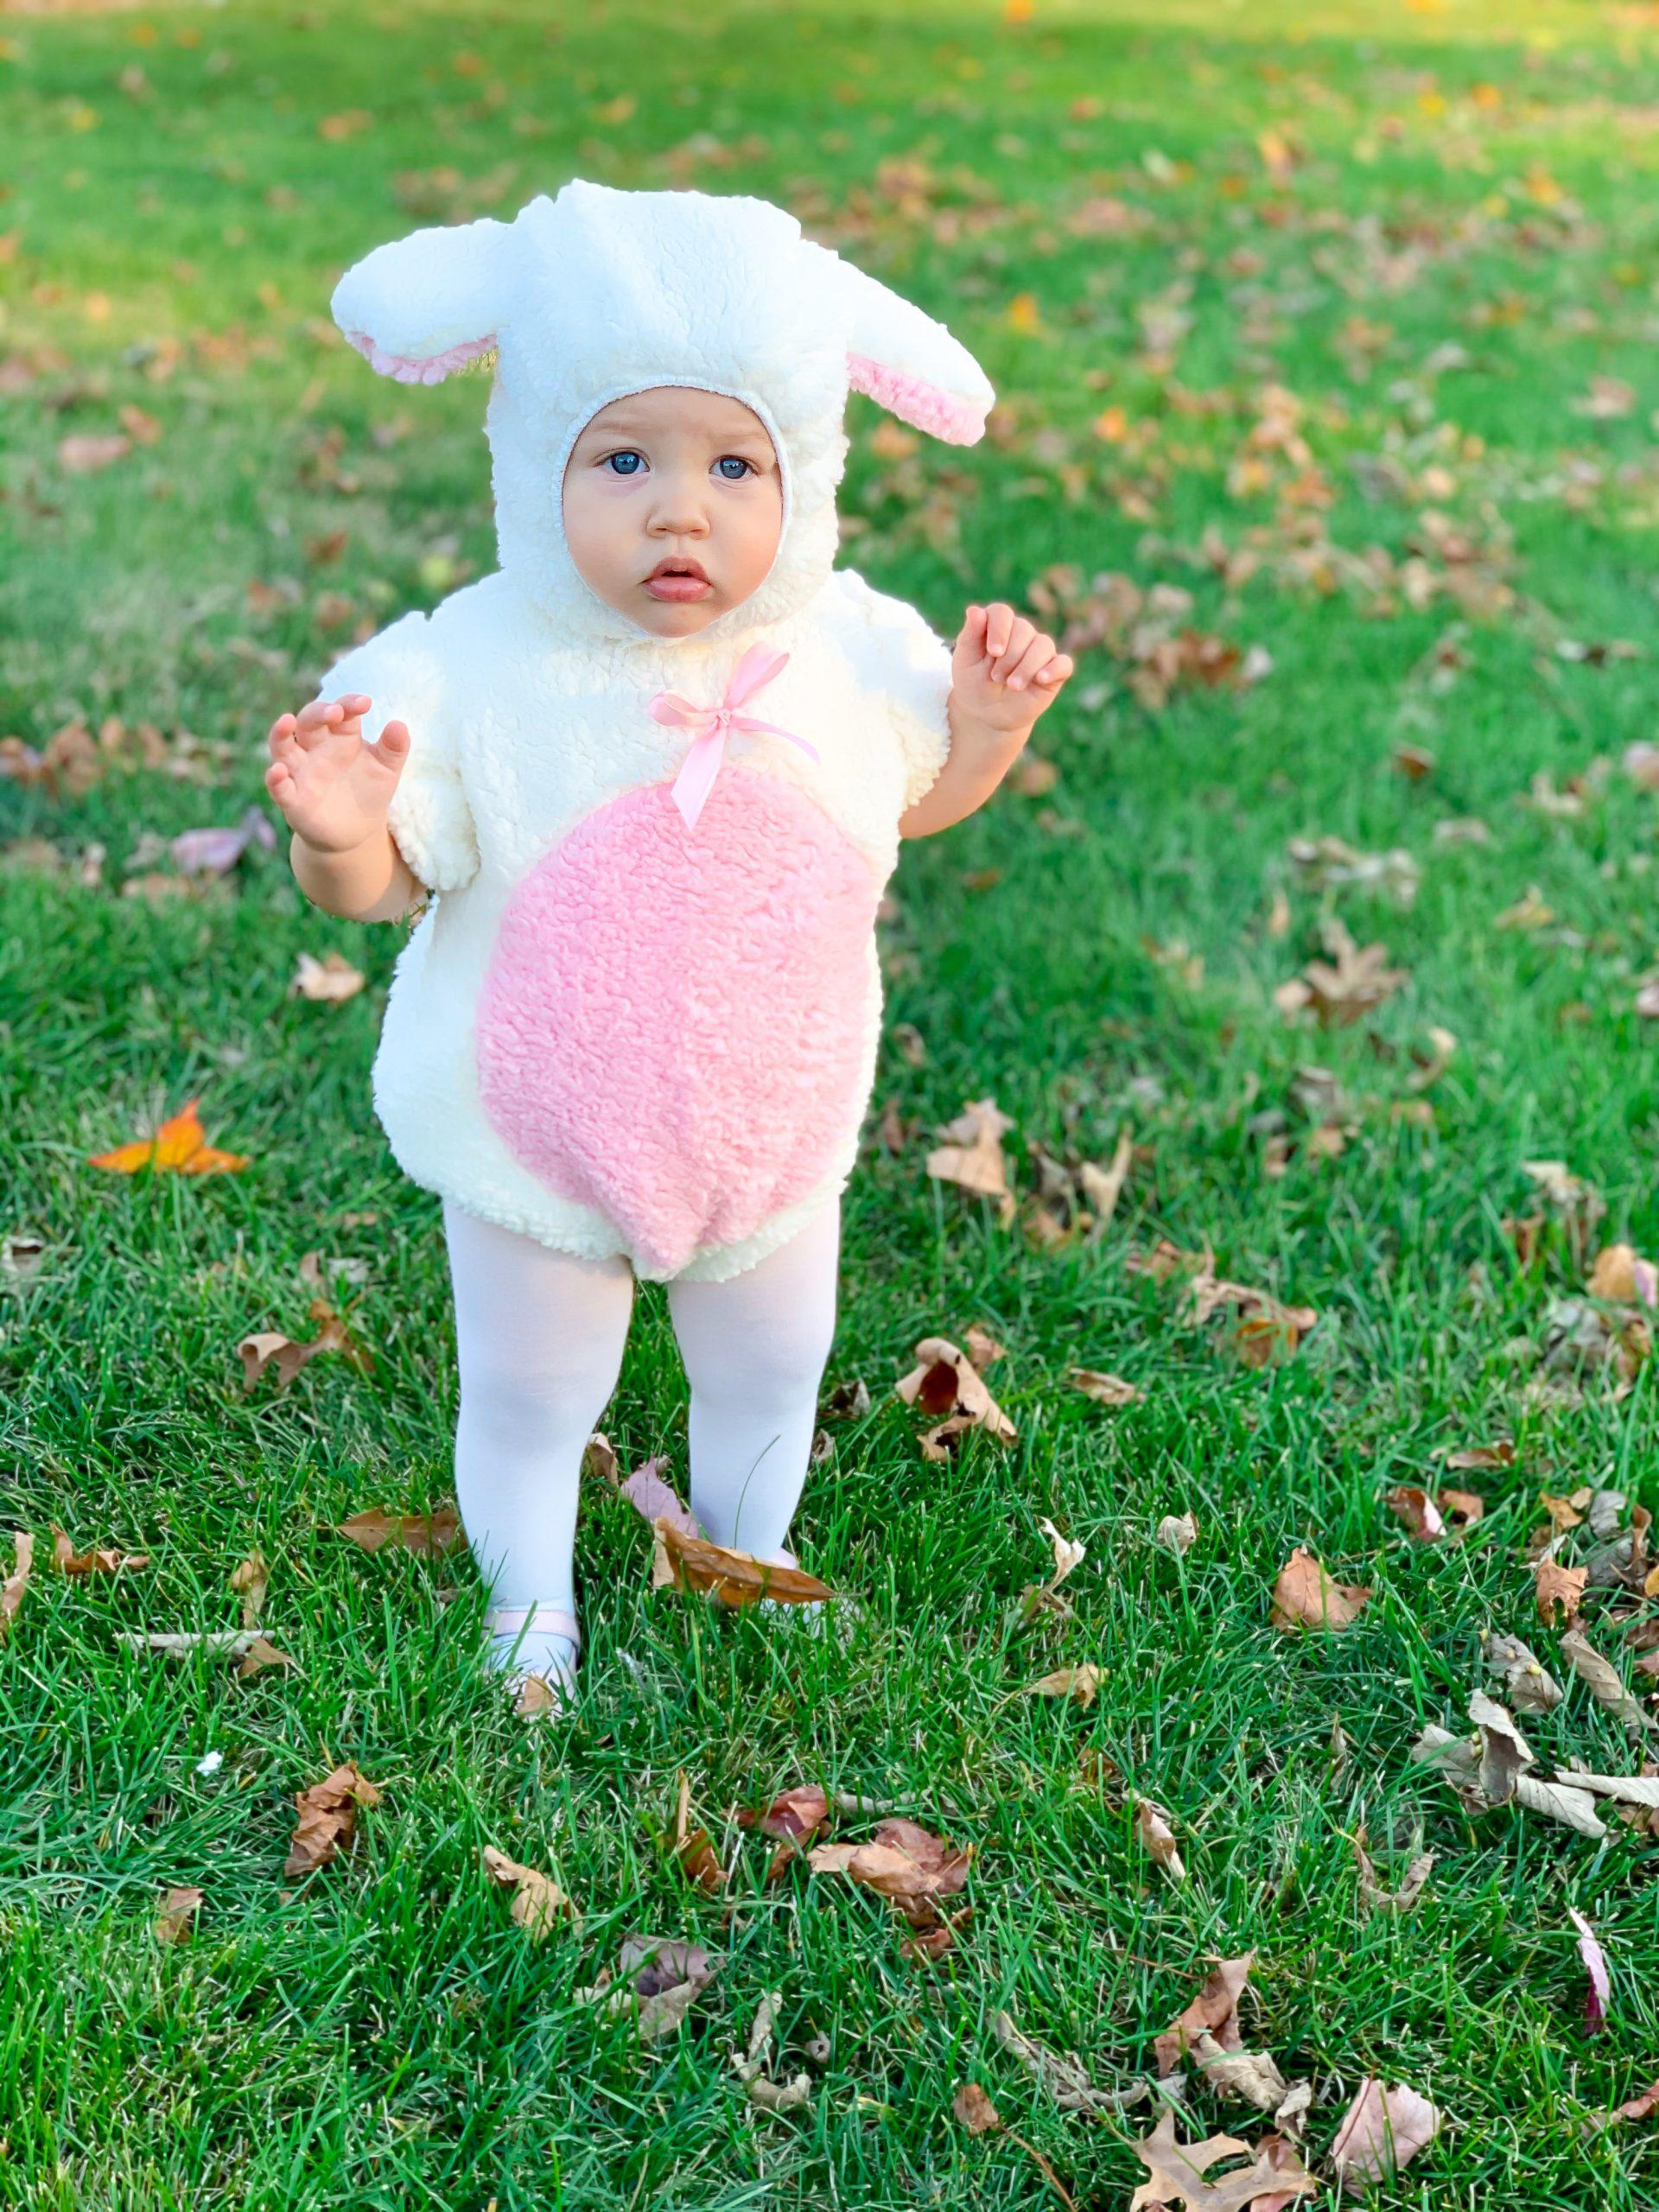 baby girl lamb costume, best baby girl halloween costumes